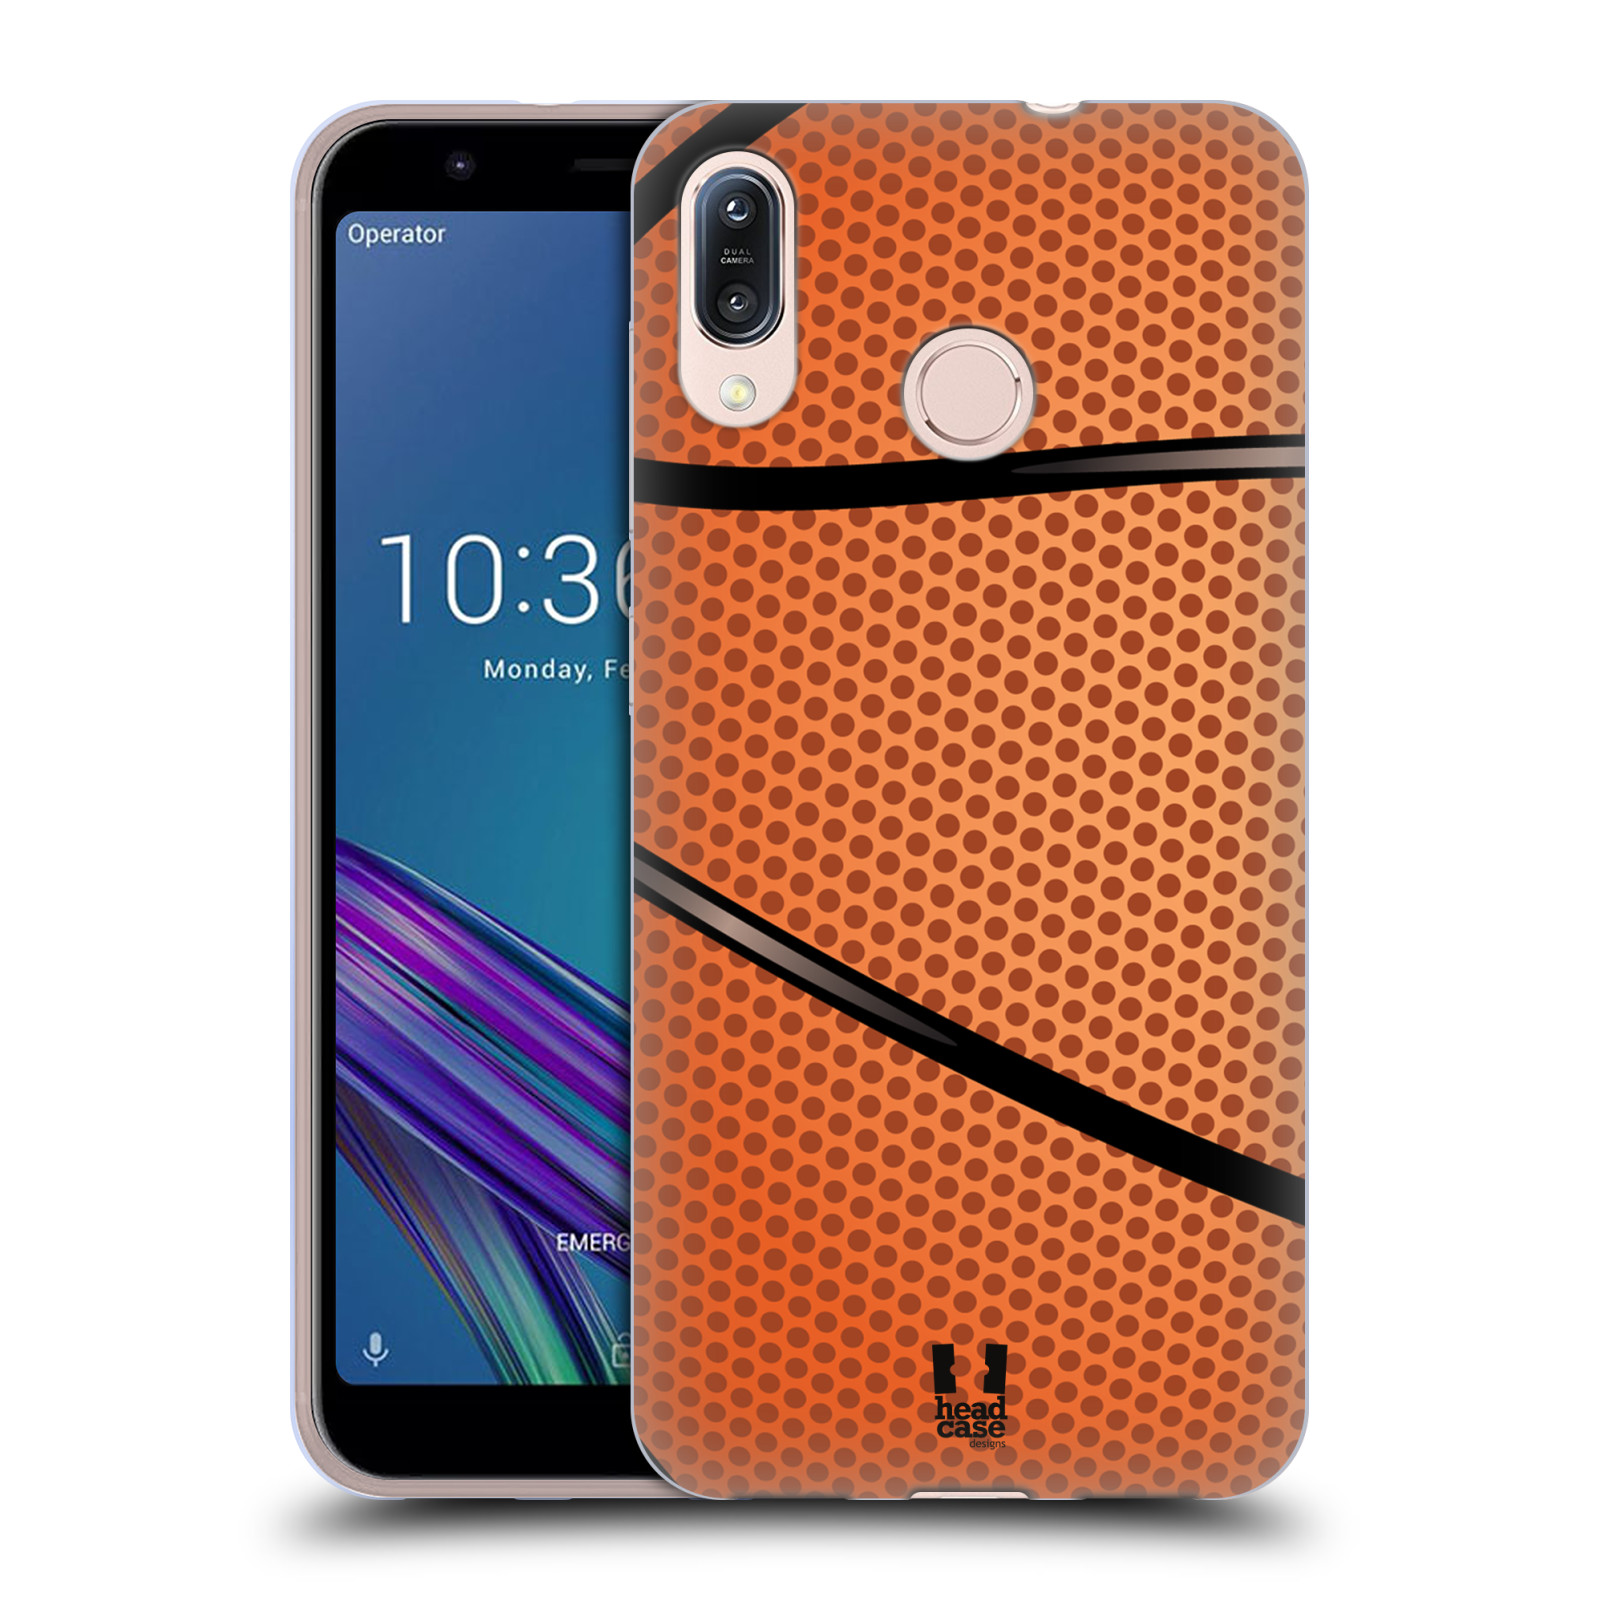 Silikonové pouzdro na mobil Asus Zenfone Max M1 ZB555KL - Head Case - BASKEŤÁK